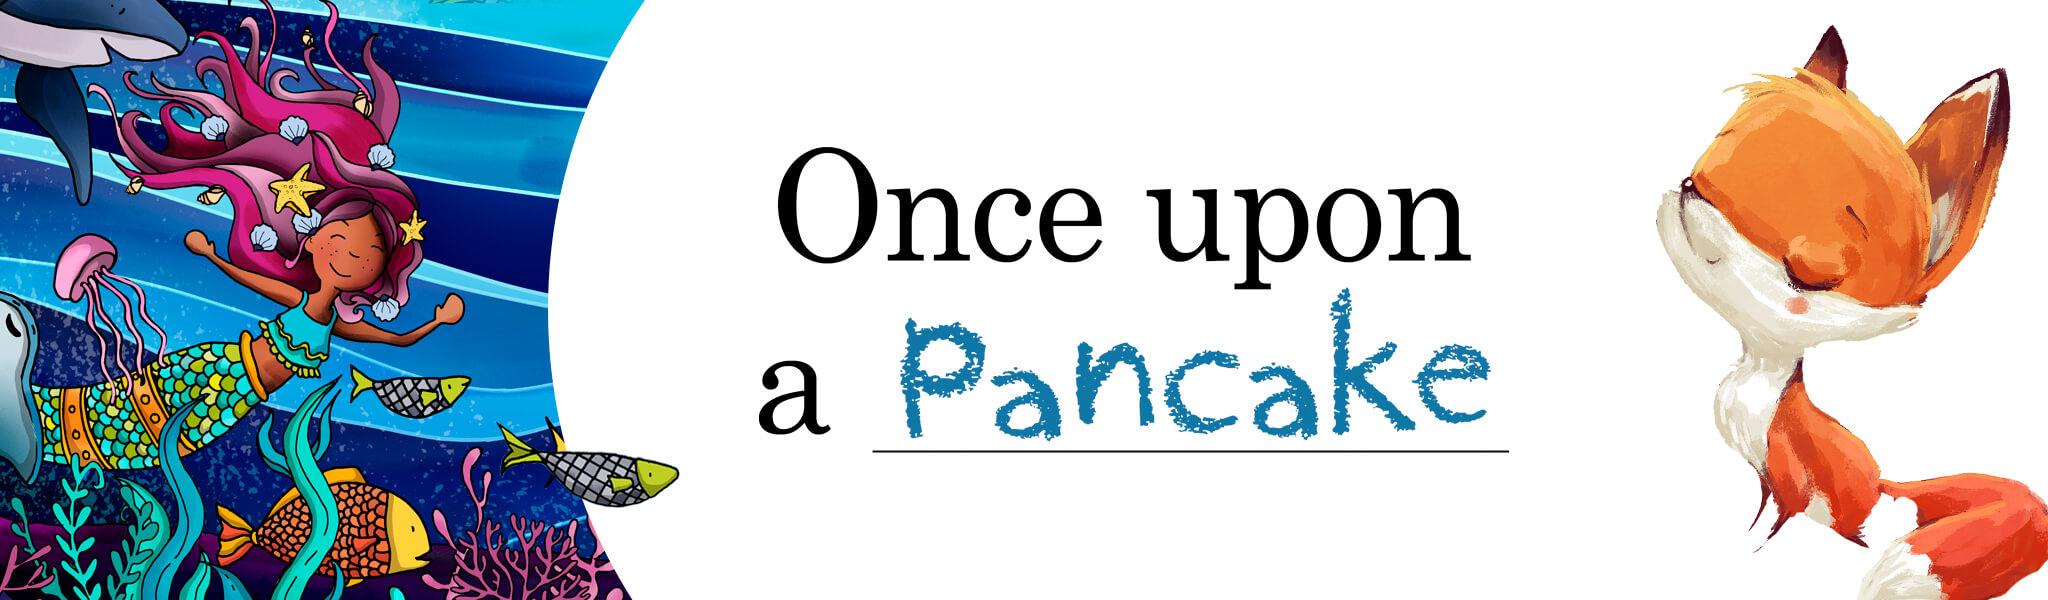 Once upon a Pancake banner